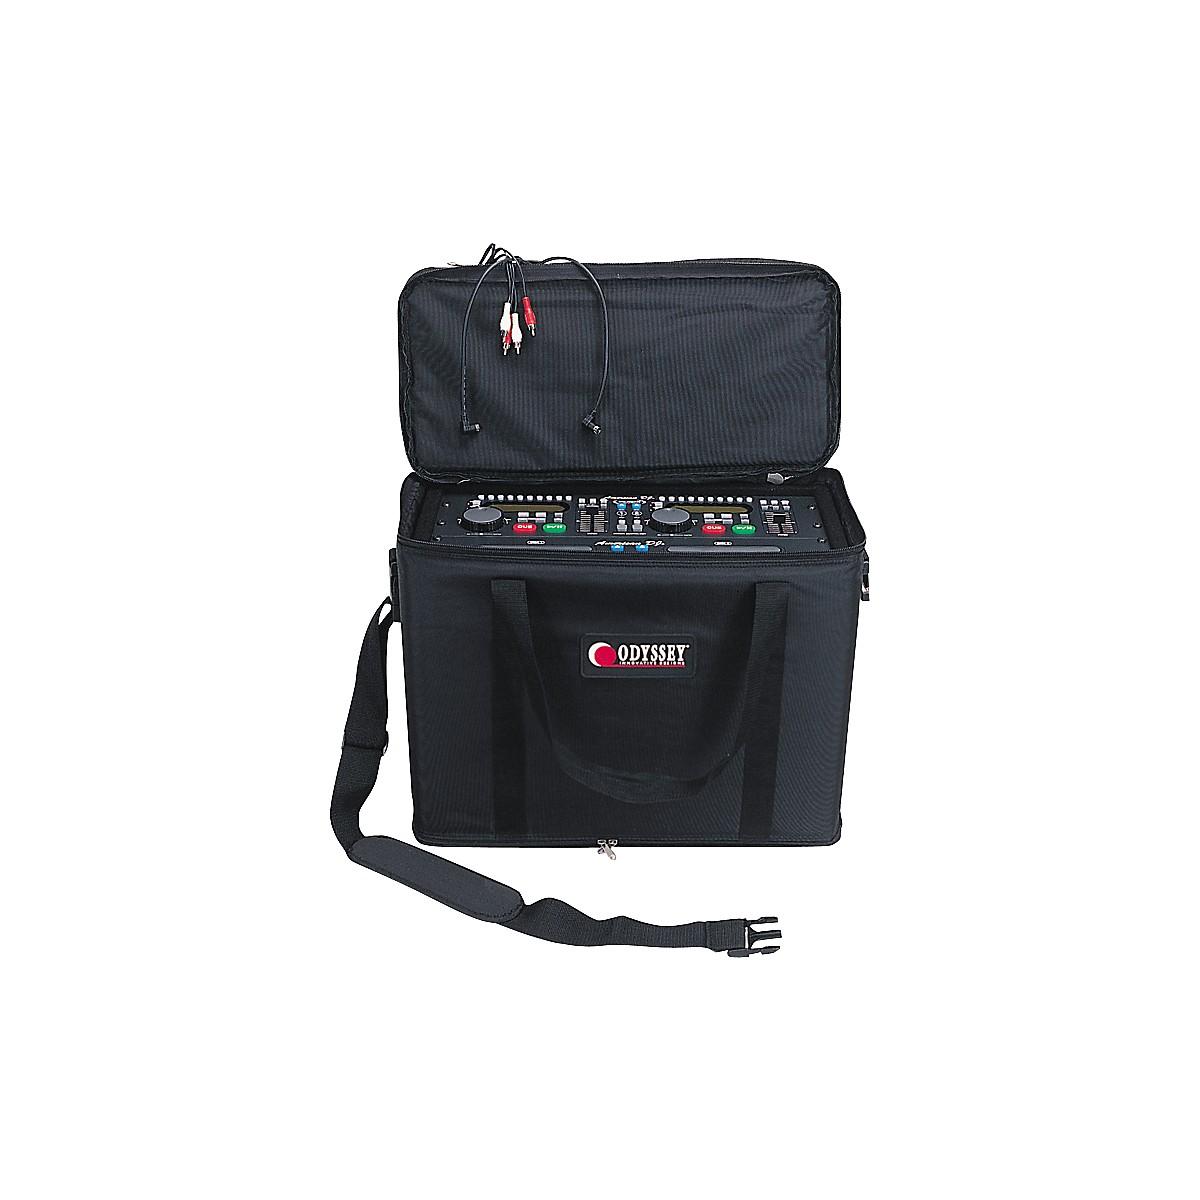 Odyssey 5-Space Rack Bag